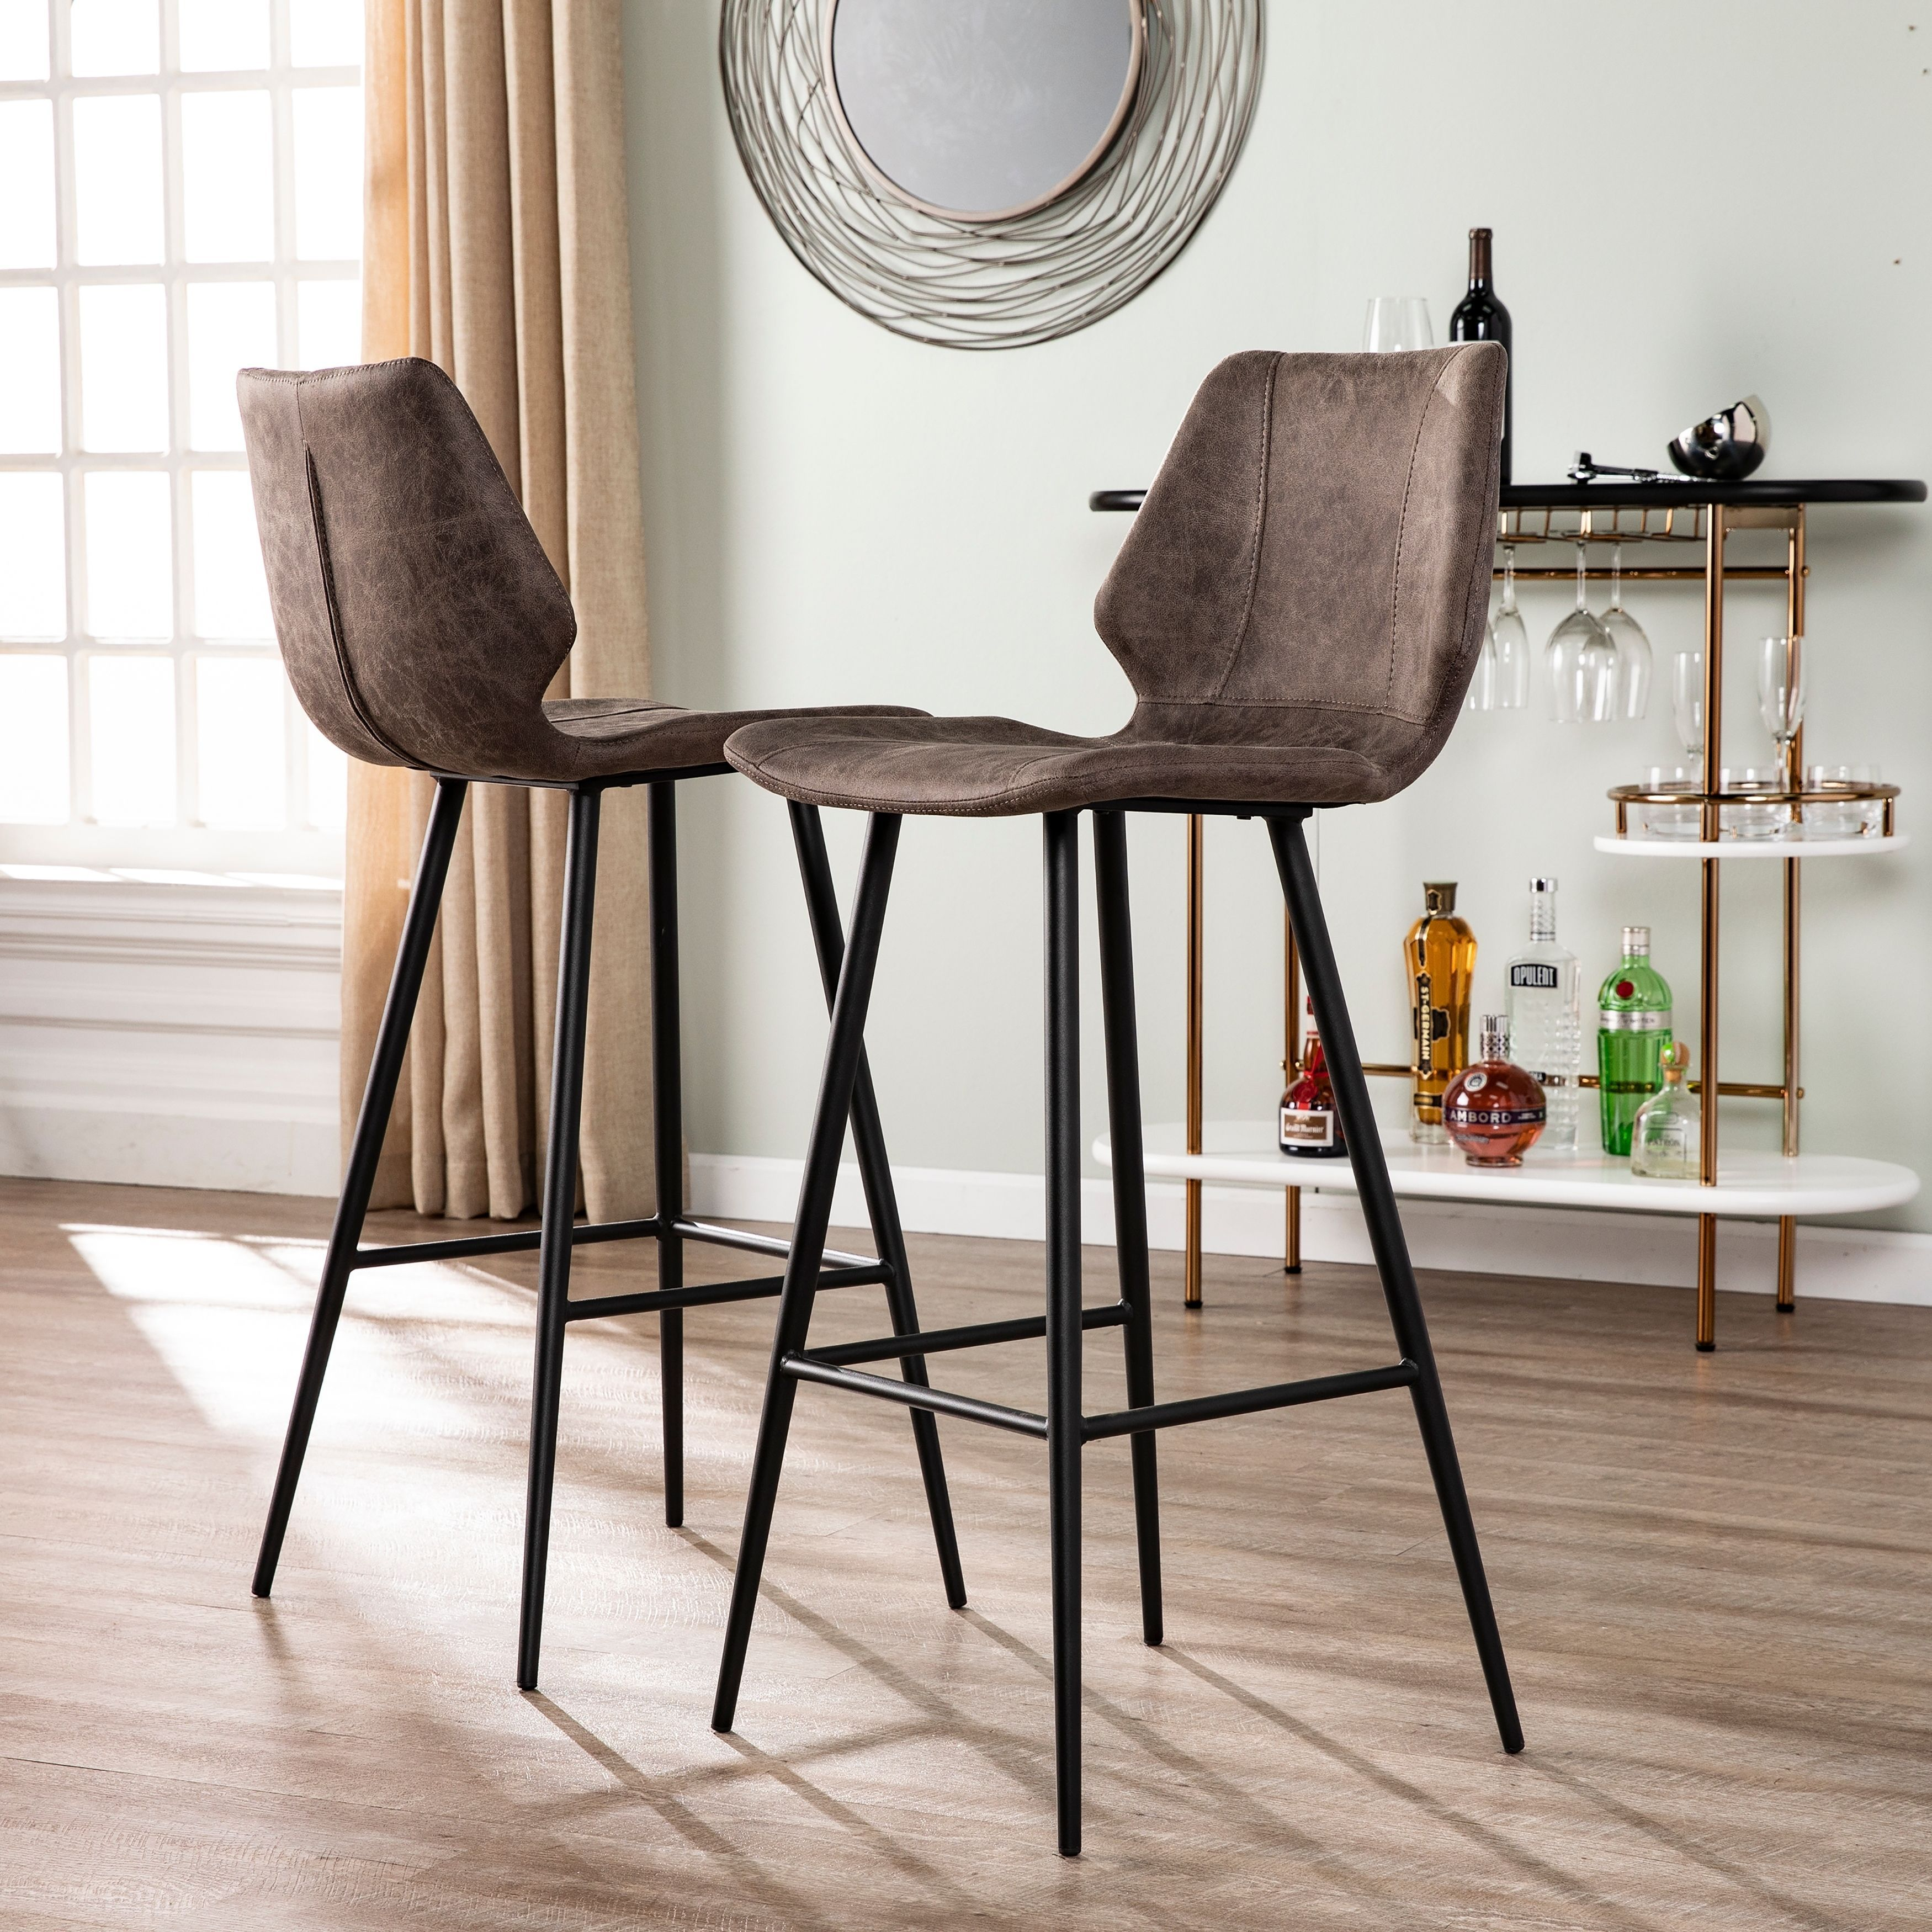 Brilliant Carbon Loft Samuel Faux Leather Barstools Set Of 2 Cjindustries Chair Design For Home Cjindustriesco